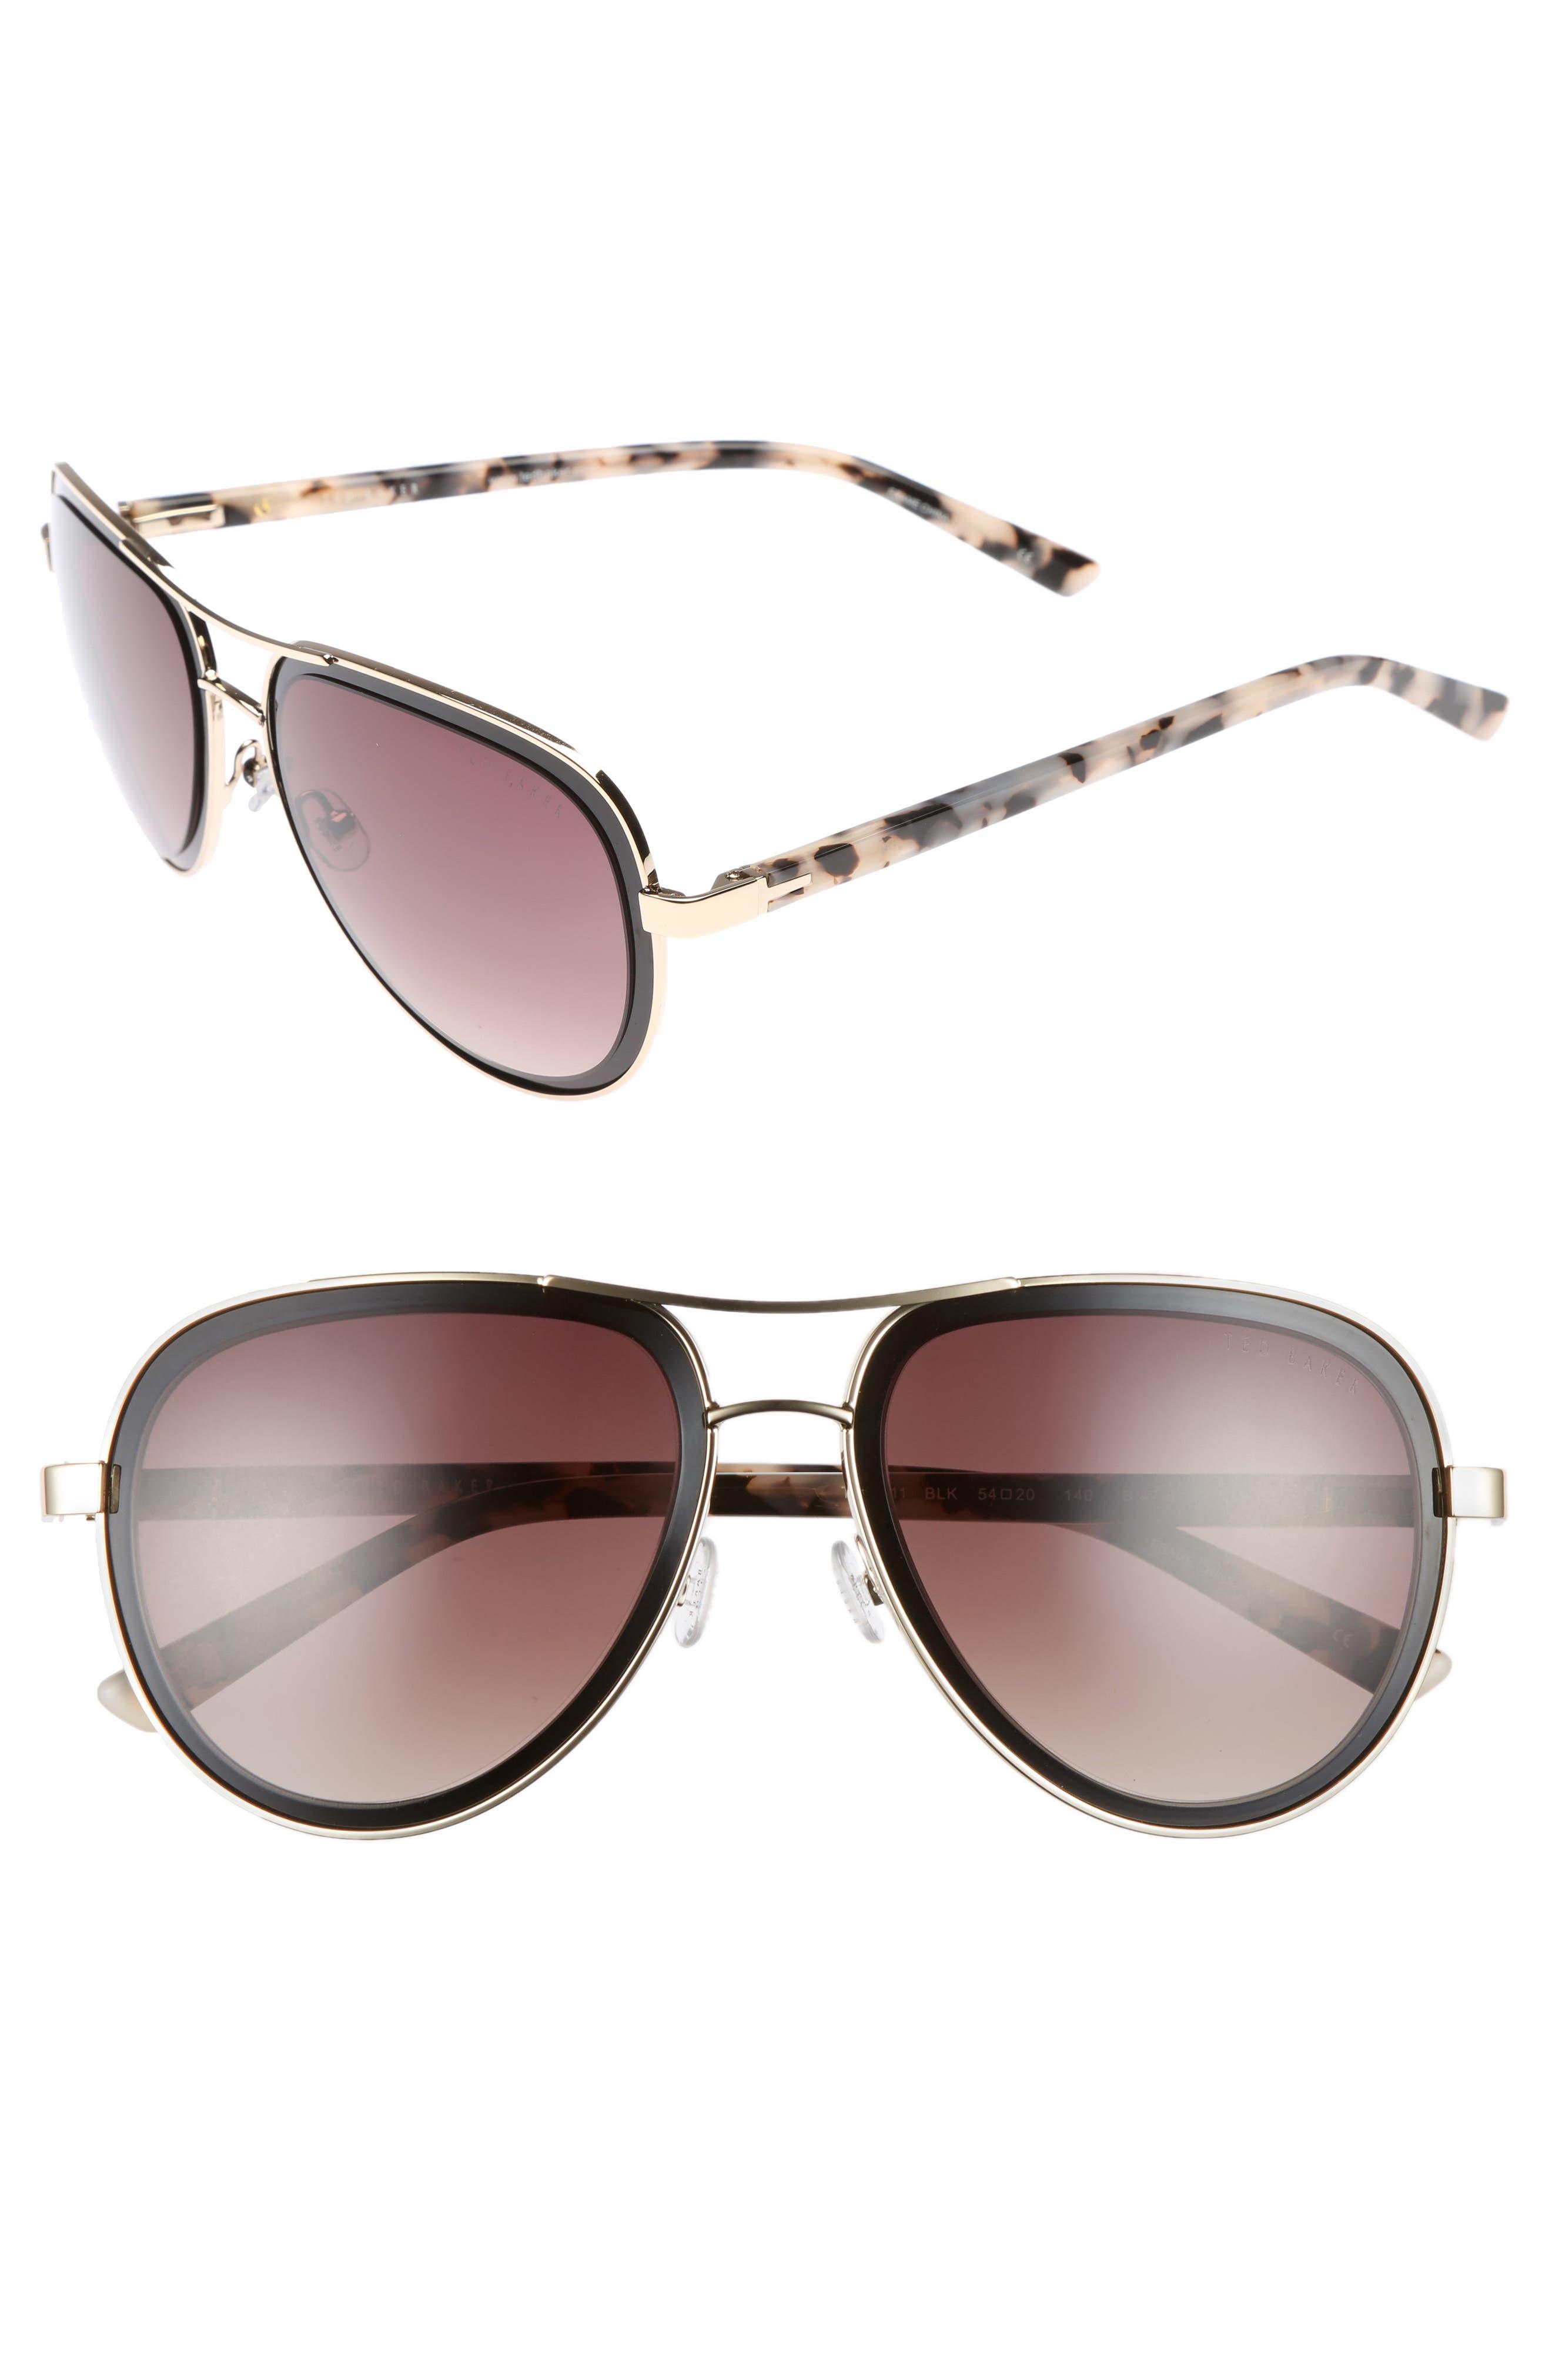 54mm Aviator Sunglasses,                             Main thumbnail 1, color,                             Black